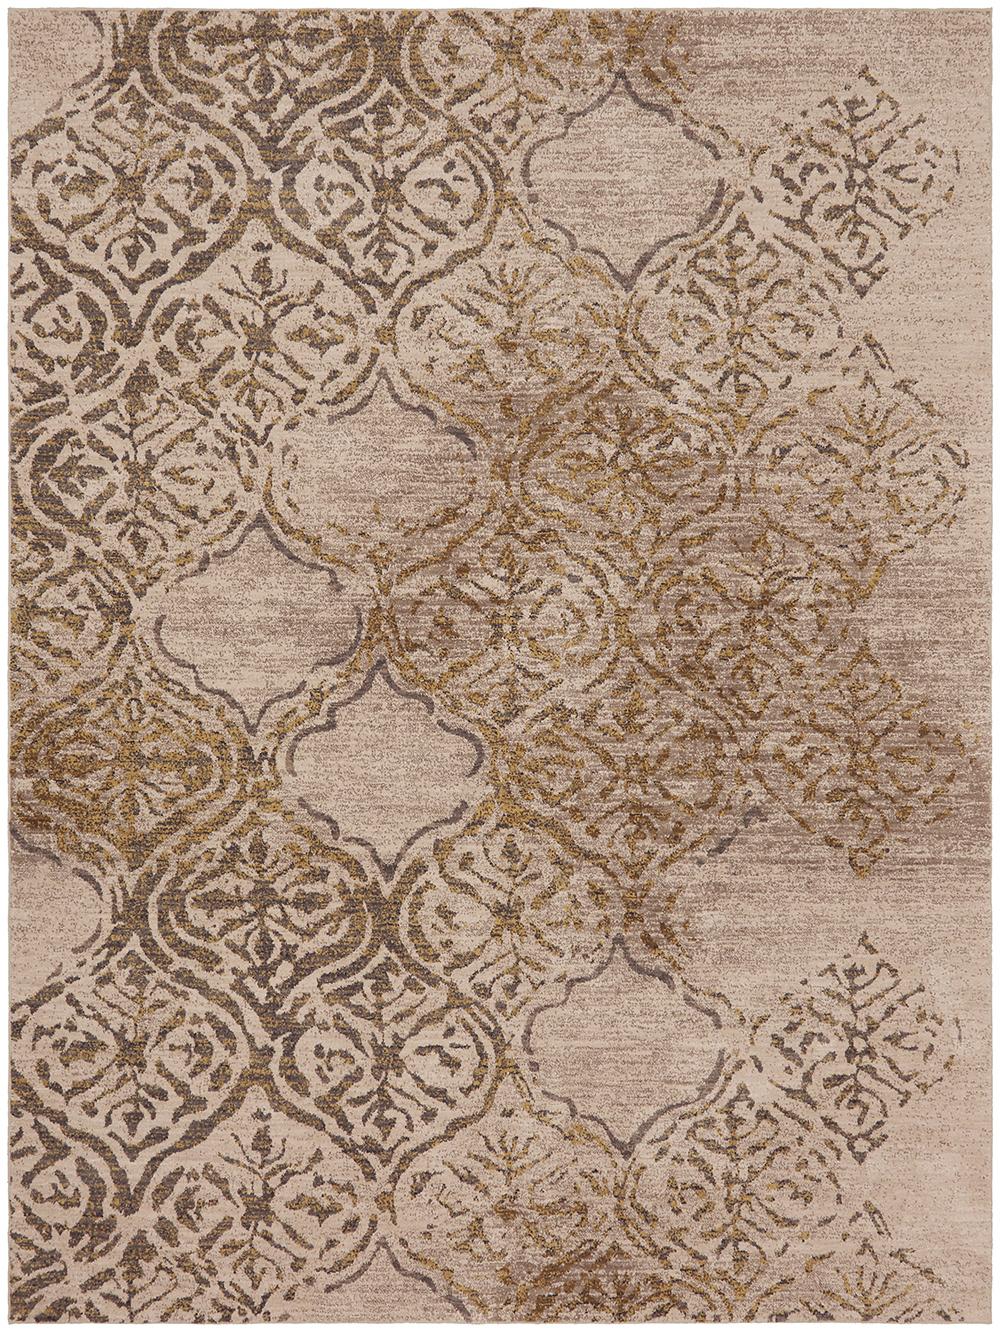 Karastan Cosmopolitan Zendaya Desert by Virginia Langley Antique White Rug